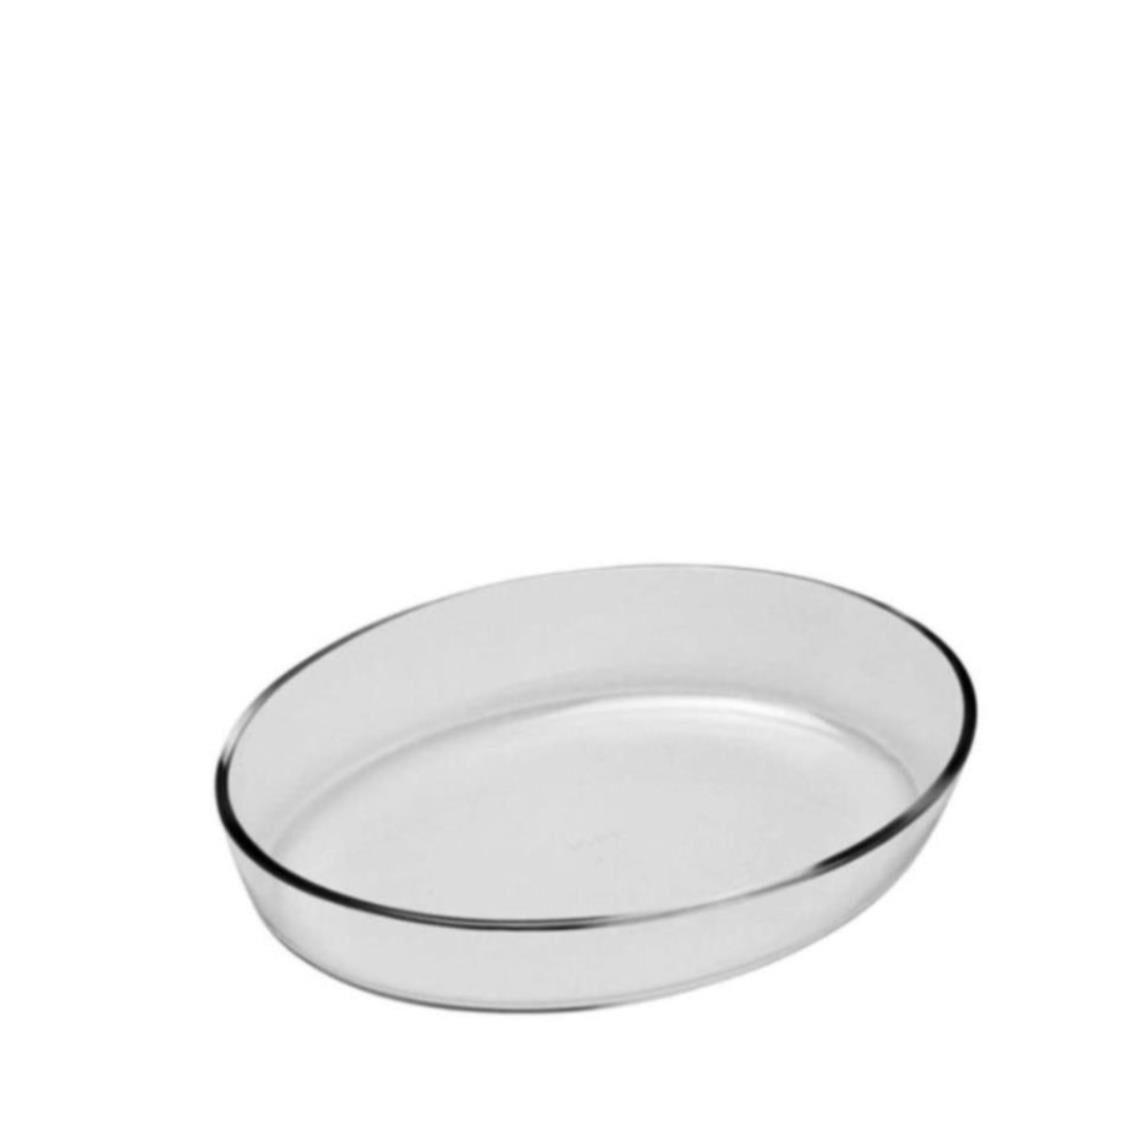 Pyrex Oval Baking Dish 30cm x 21cm